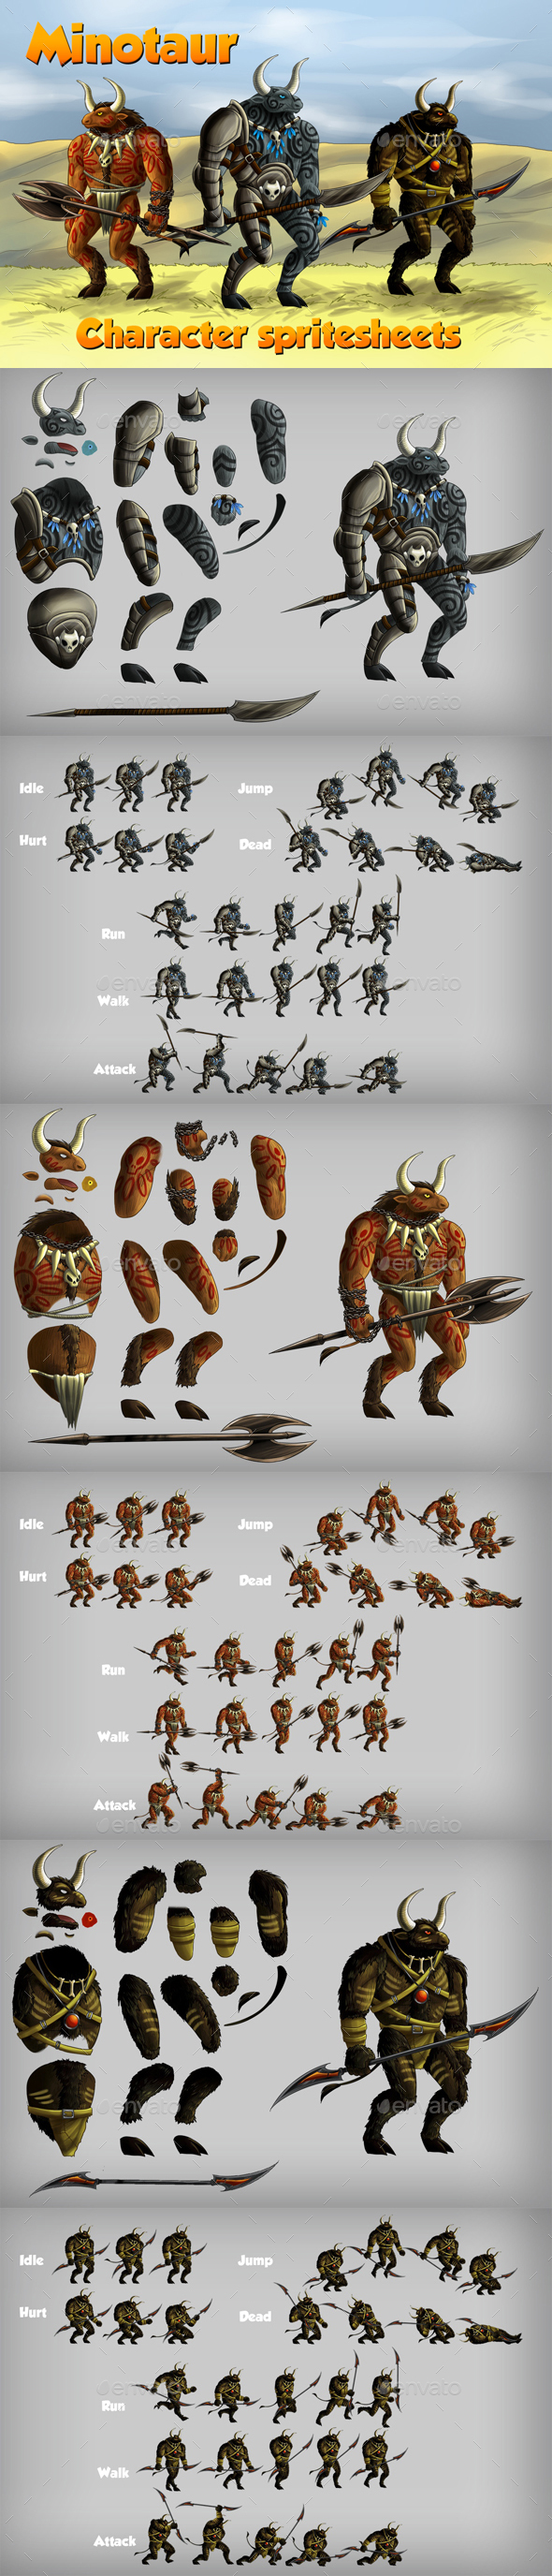 2D Game Minotaur Character Spritesheet (Sprites)